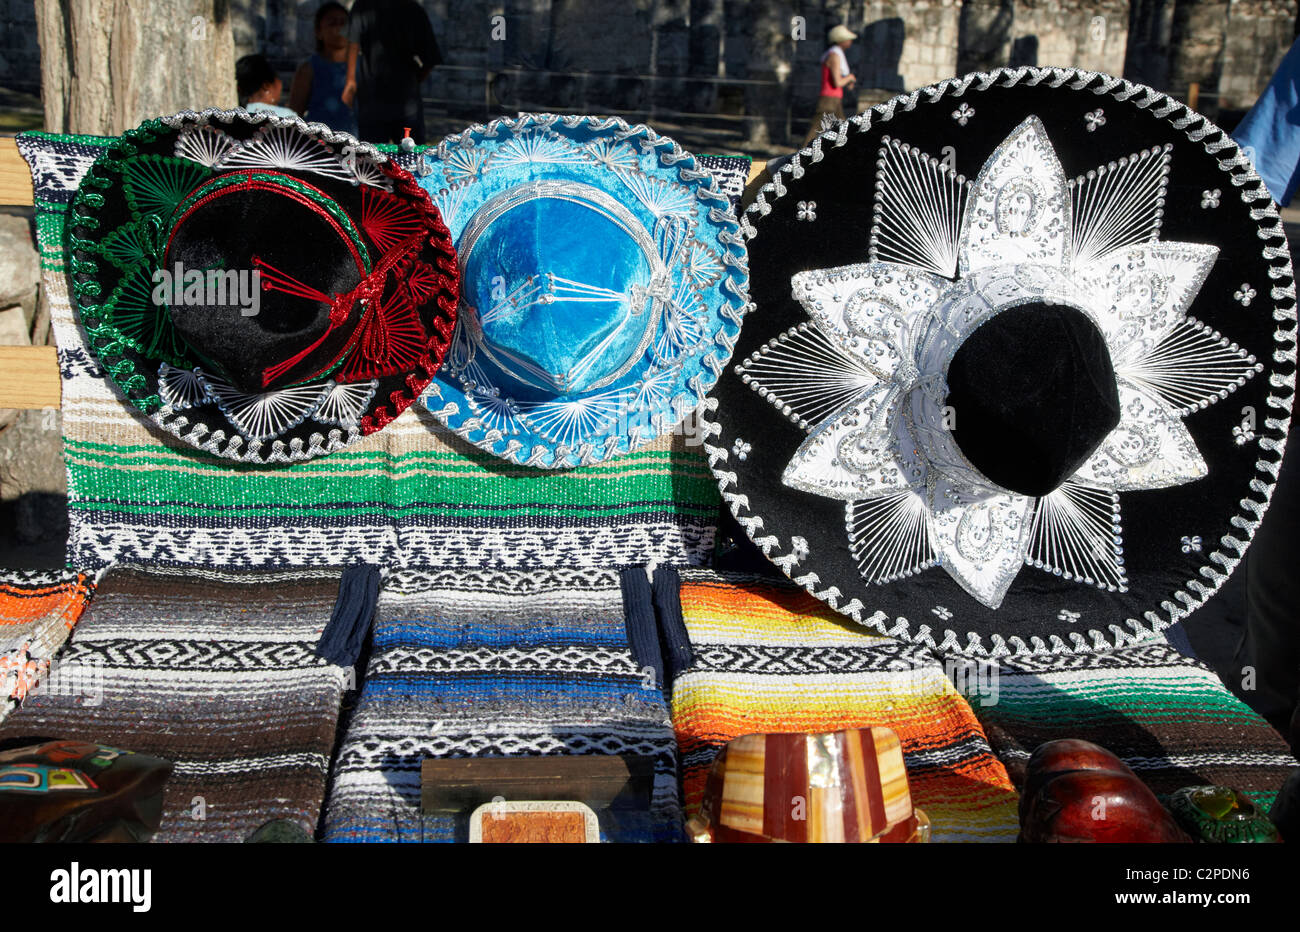 Sombreros de estilo mexicano para venta de Chichén Itzá México Imagen De  Stock 379099c6b80